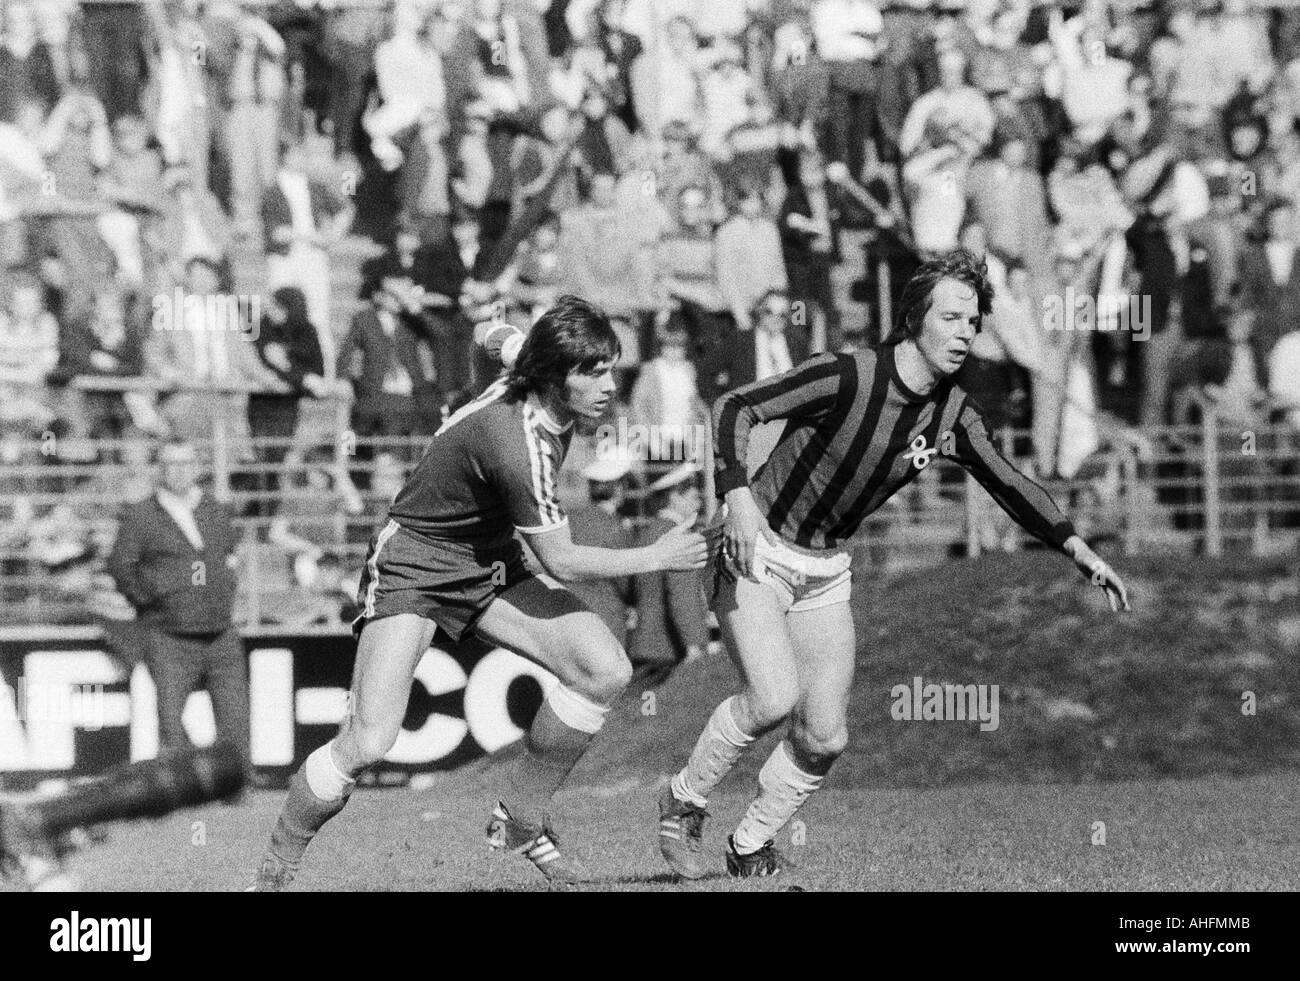 football, Bundesliga, 1971/1972, VfL Bochum versus Hanover 96 2:2, Stadium at the Castroper Strasse in Bochum, scene of the match, Hans Walitza (Bochum) left and Peter Anders (96) - Stock Image